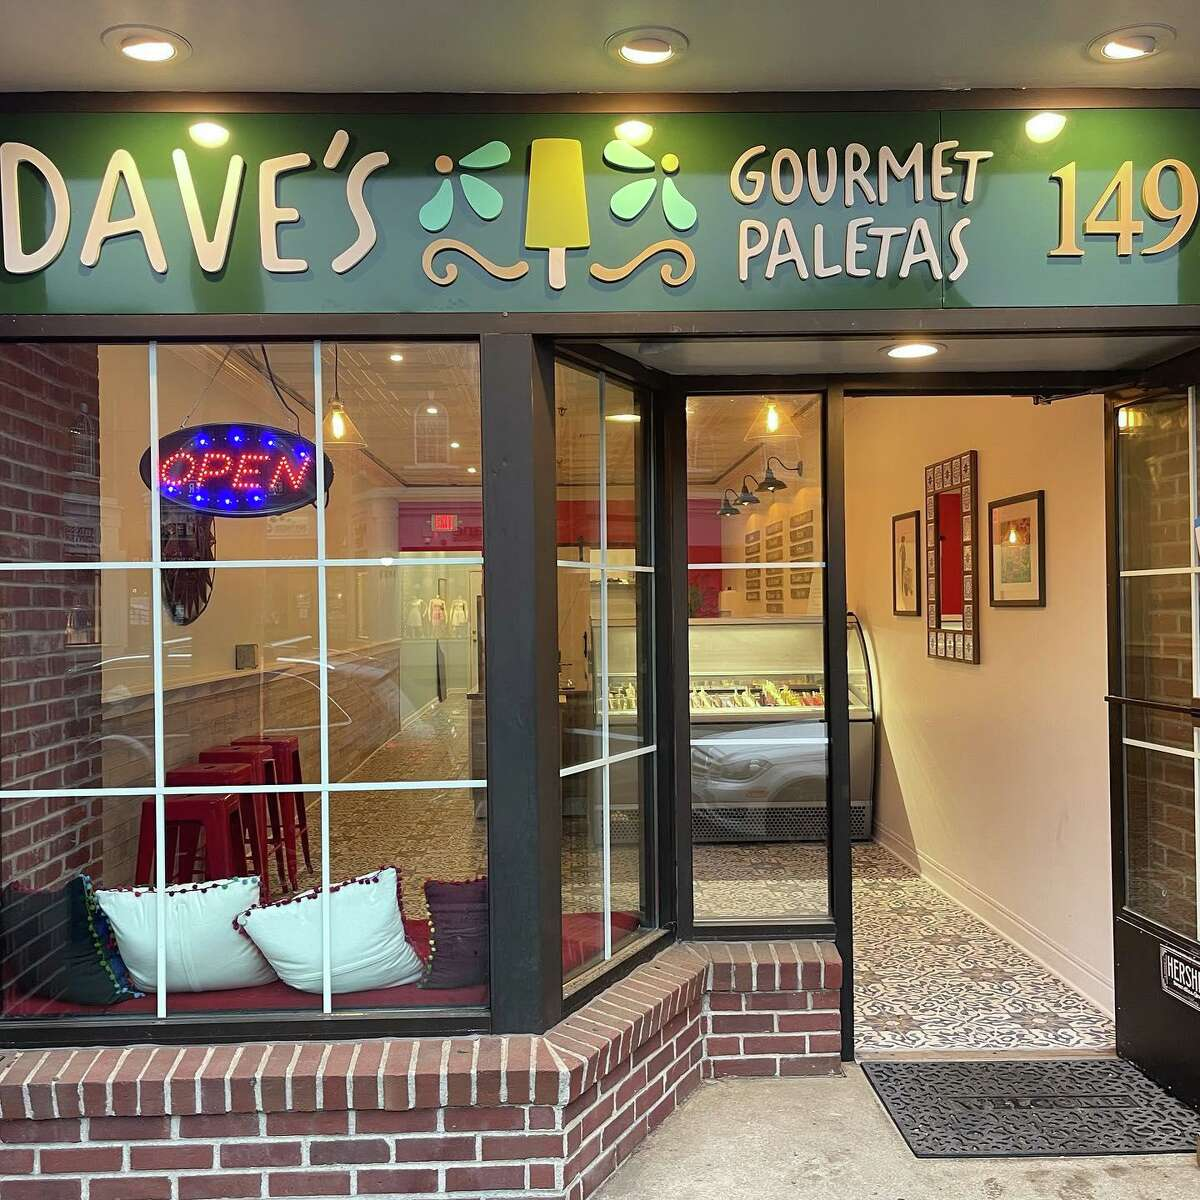 Dave's Gourmet Paletas is at 1492 Post Road in Fairfield.